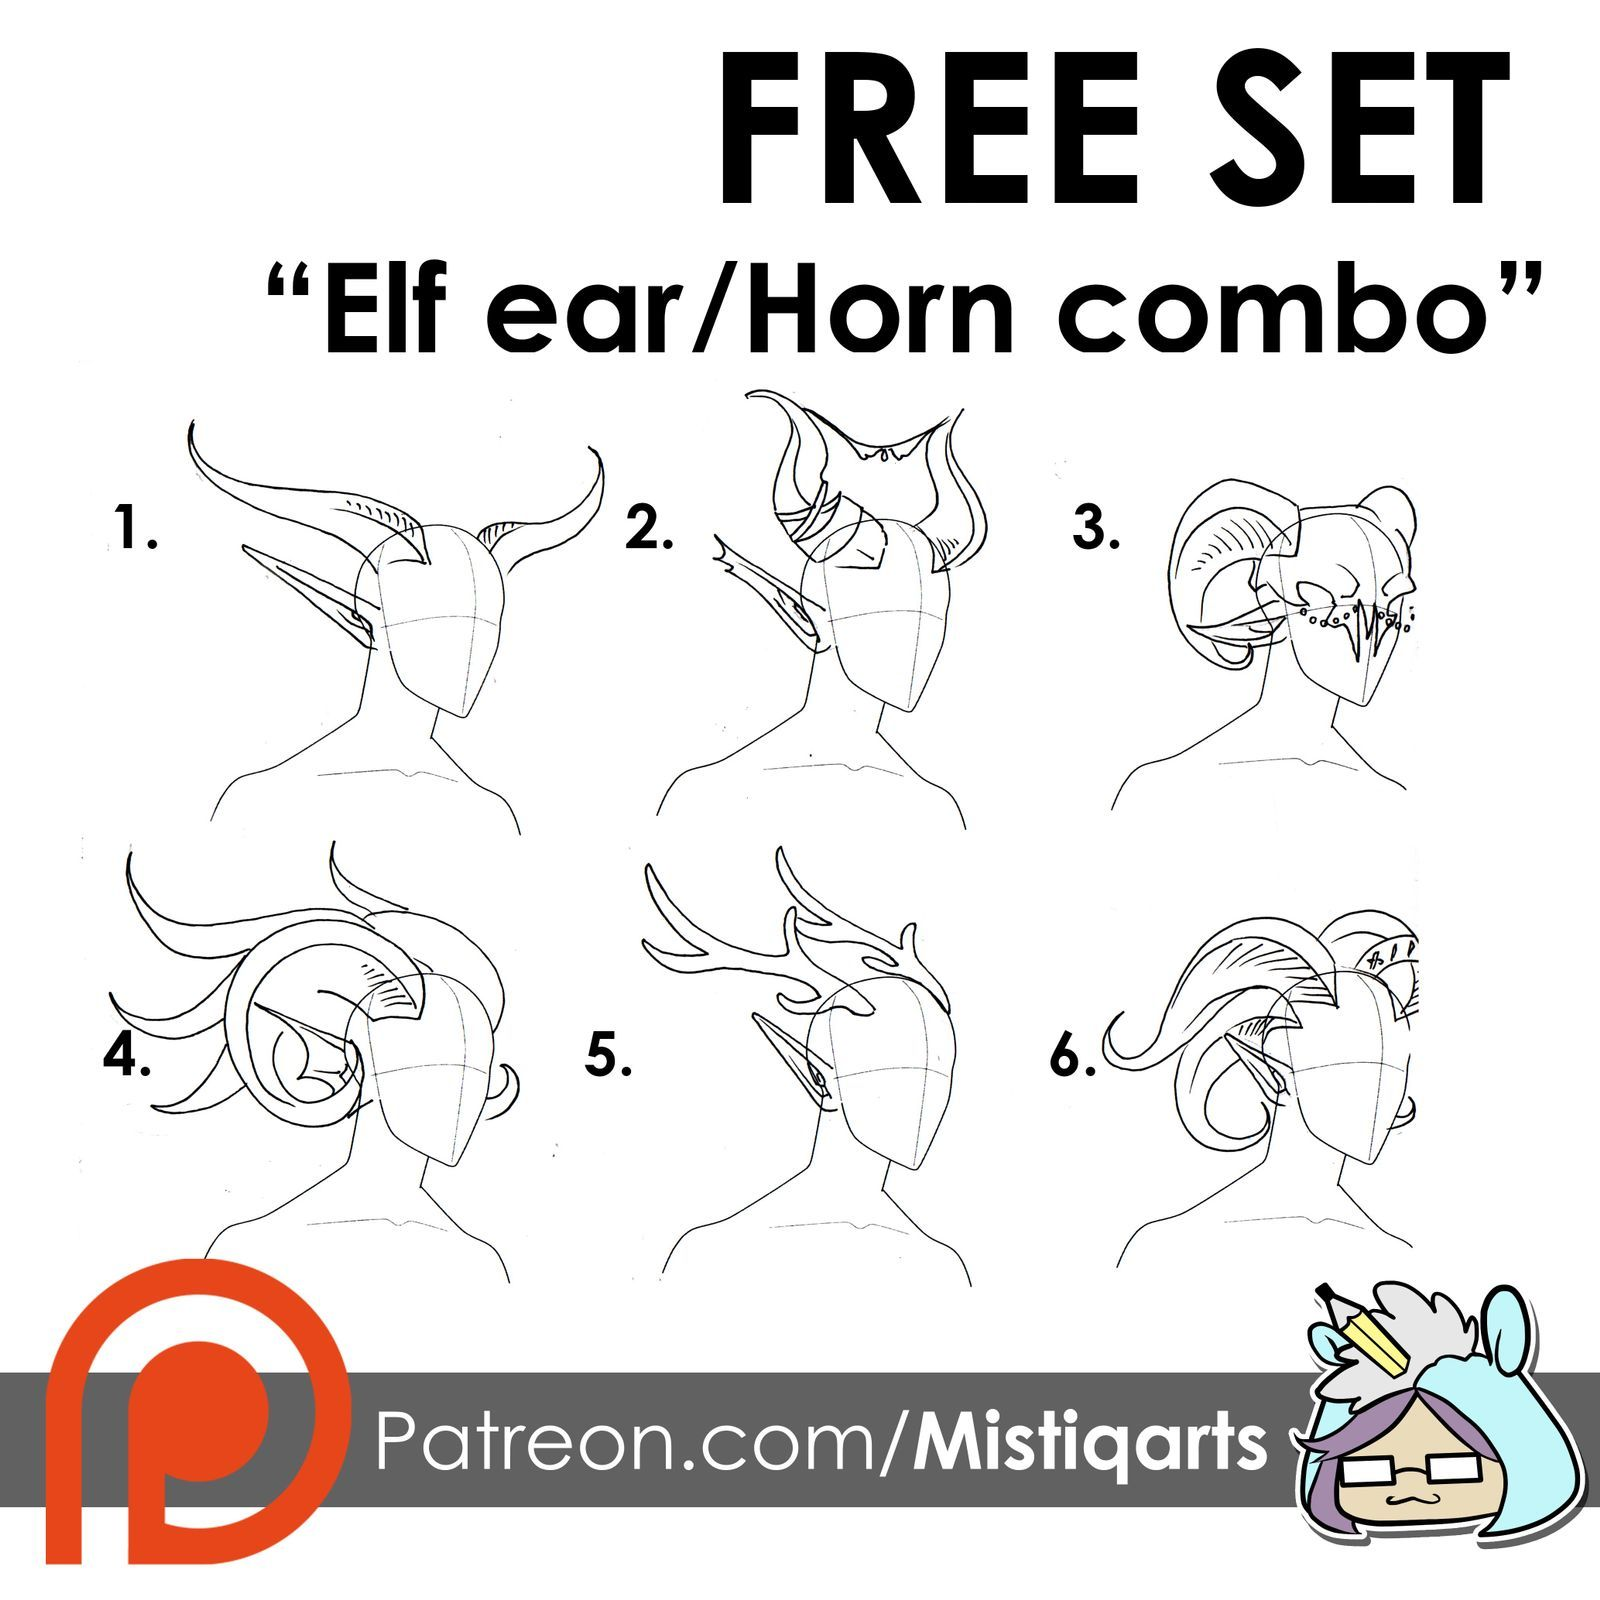 Free Pack Elf Ears And Horns Combo Sets Mistiqarts On Patreon Elf Ears Graphic Novel Illustration Elf